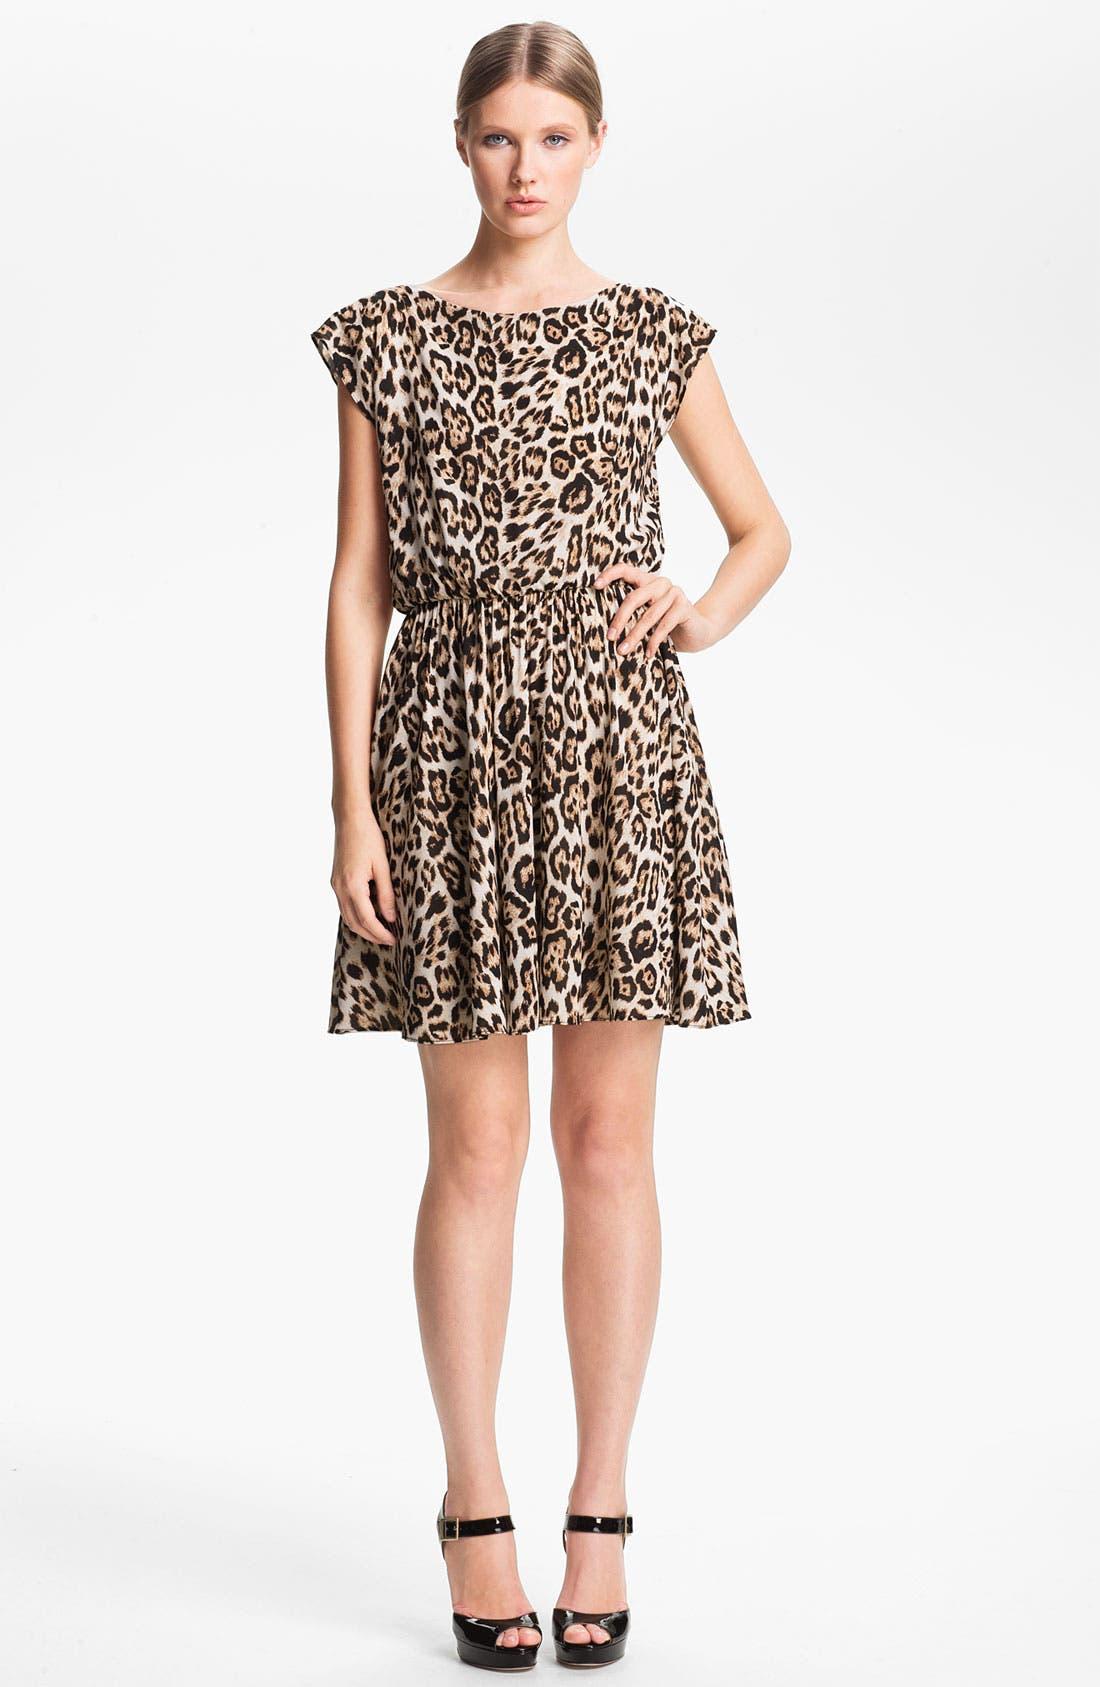 Alternate Image 1 Selected - Alice + Olivia Leopard Print Dress